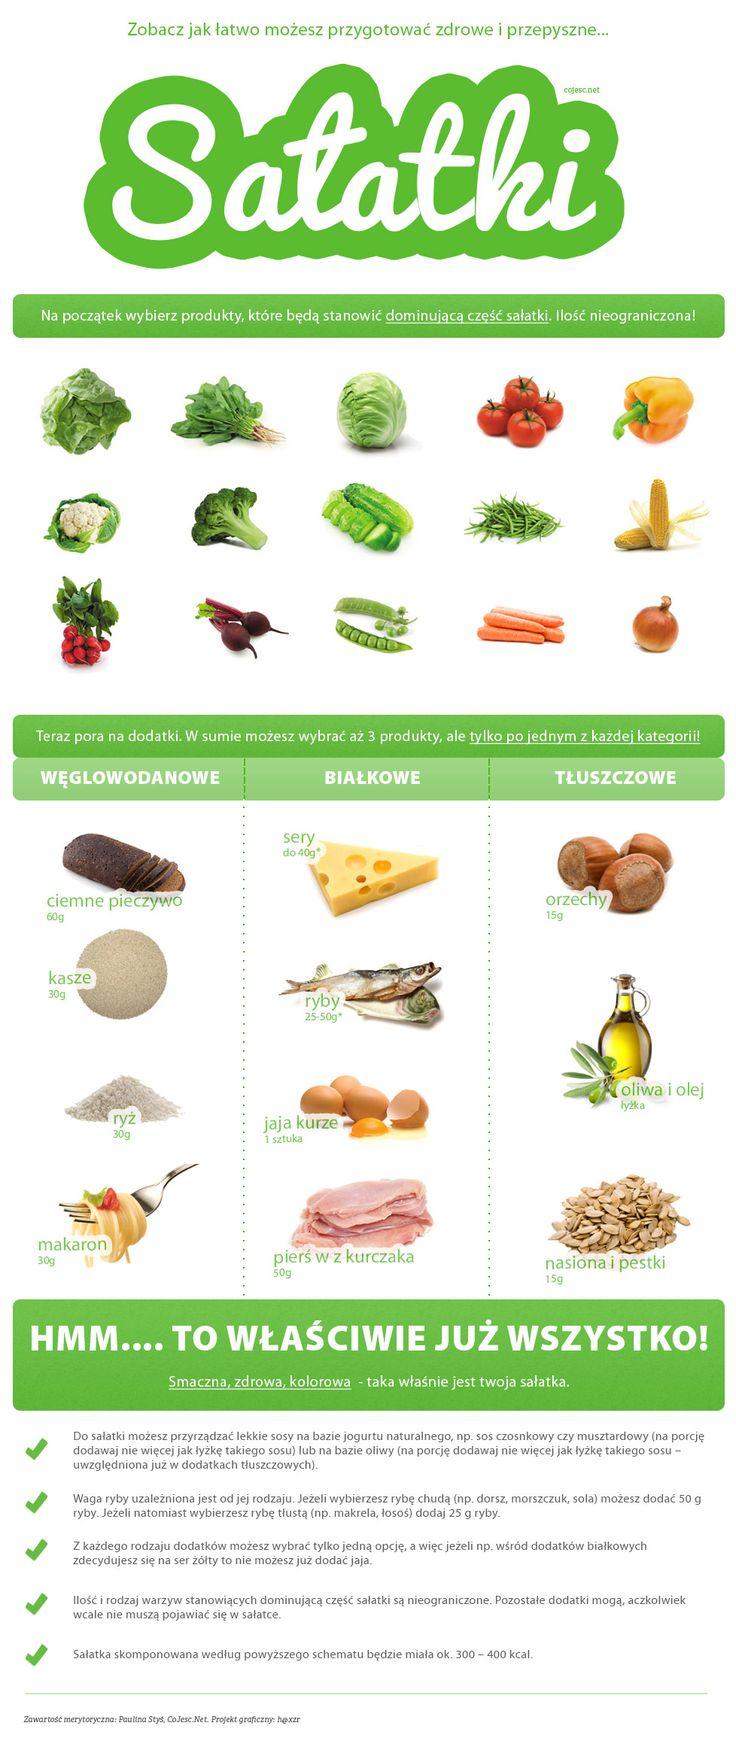 Salands